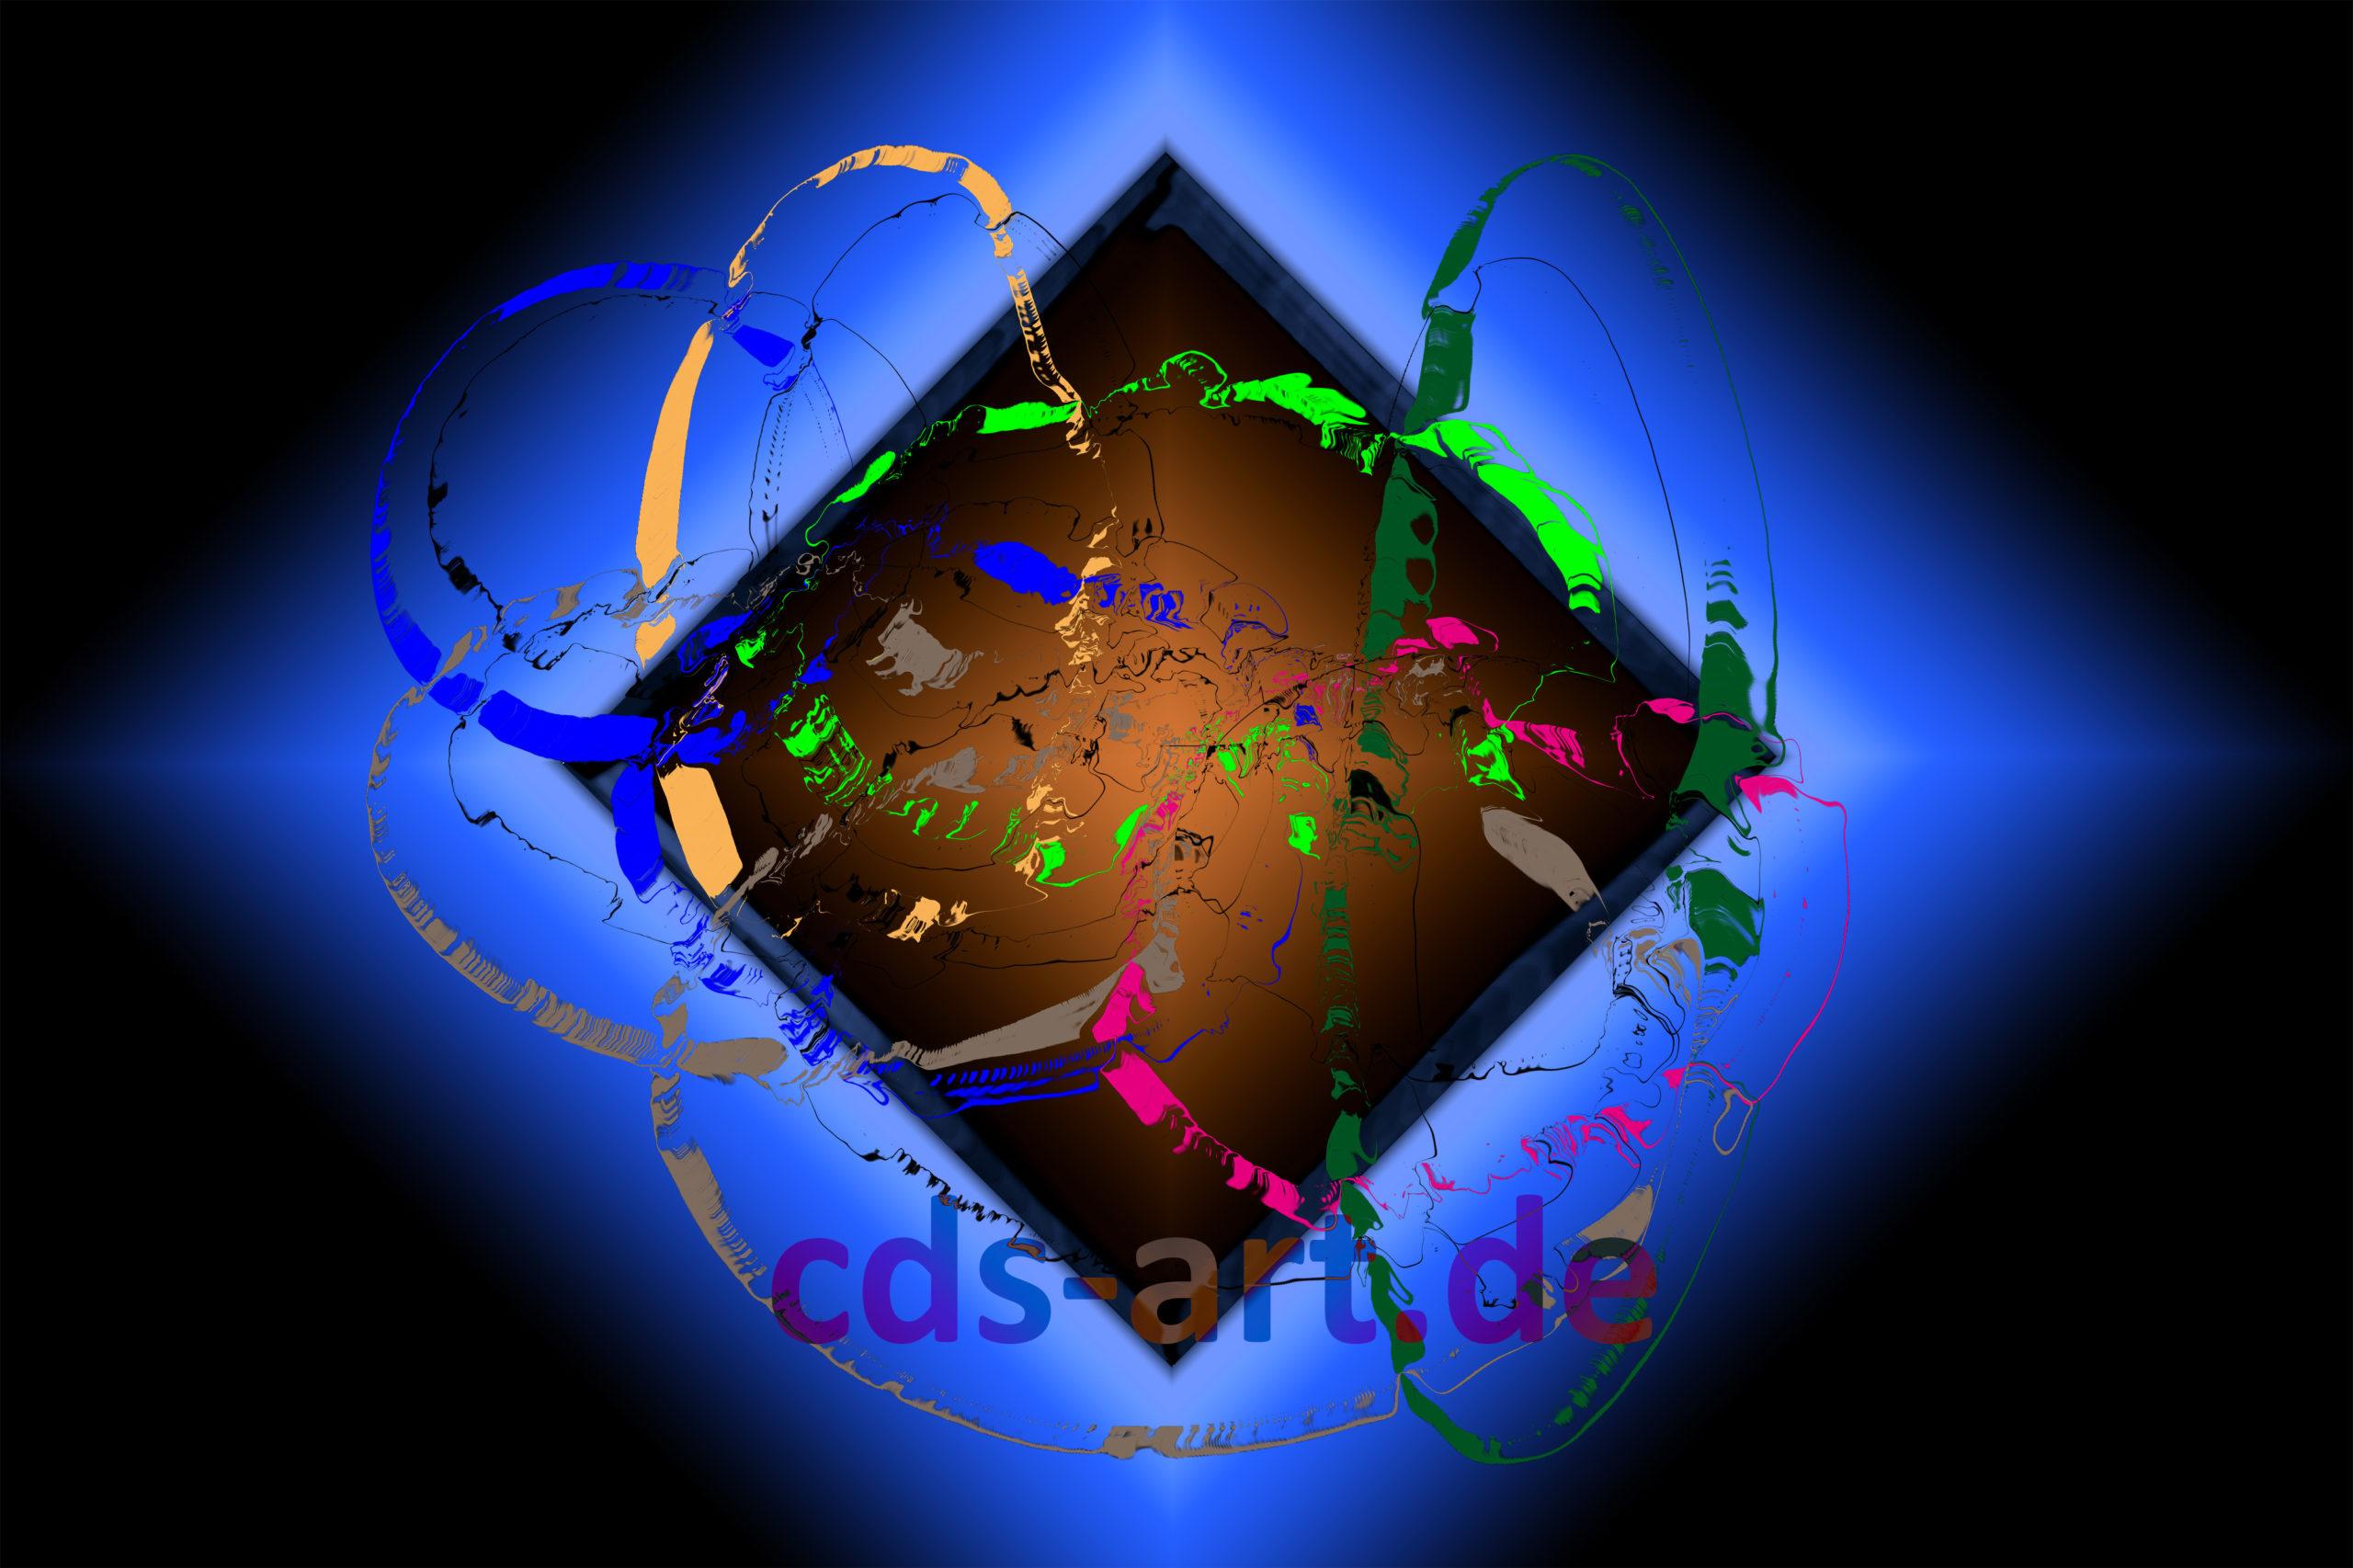 colorworks 3